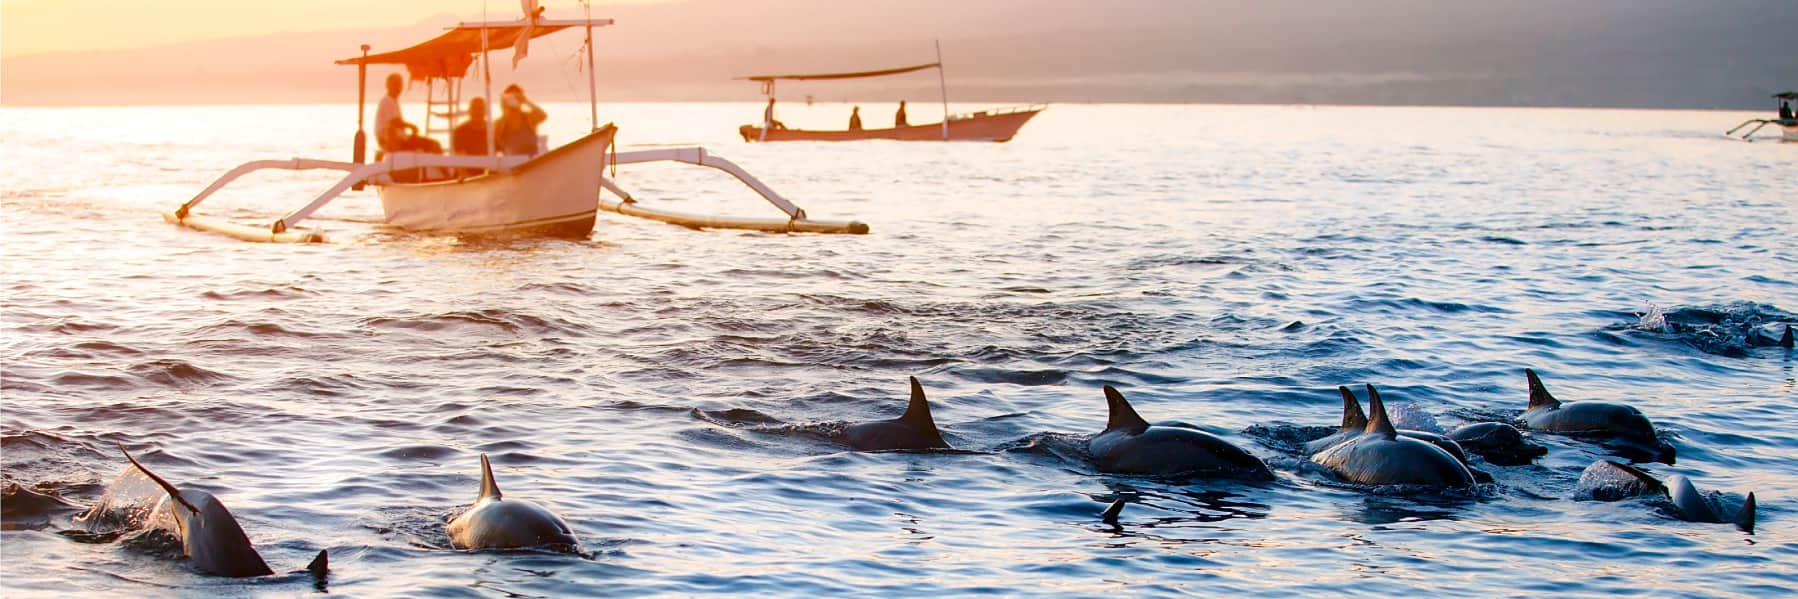 Bali Dolphin Watching & Sunrise at Lovina Beach – Full Day gallery